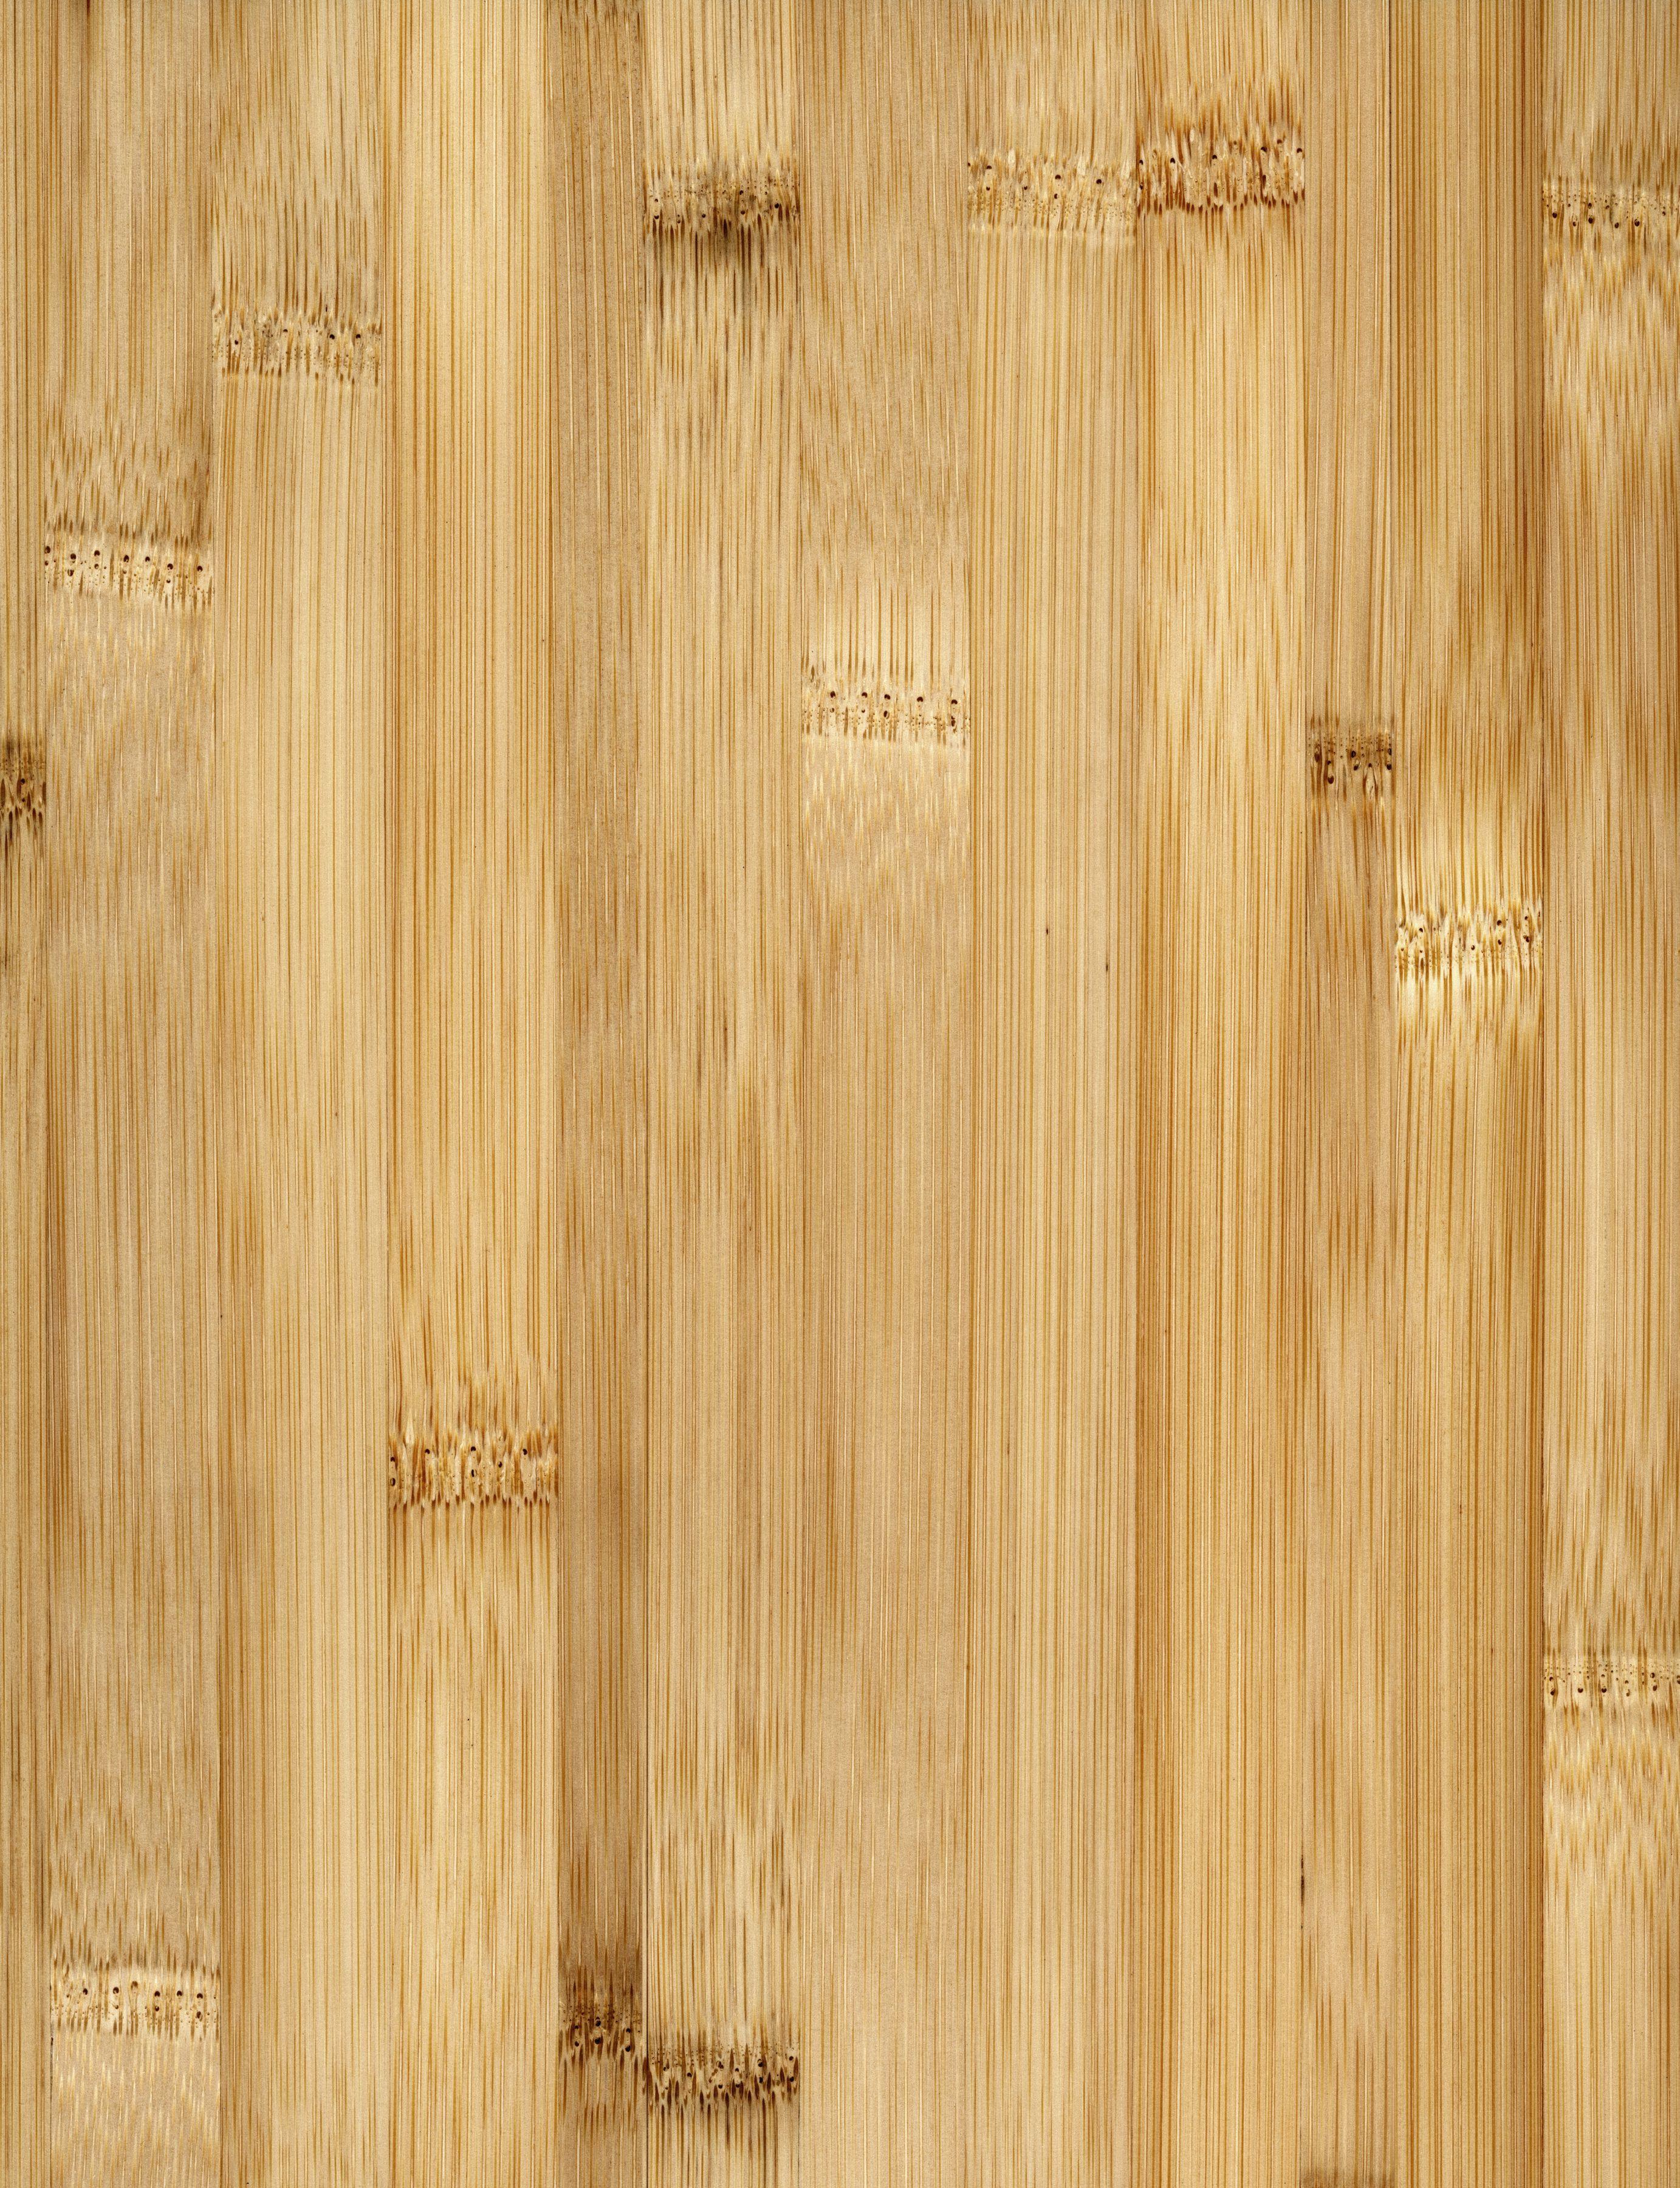 janka hardness scale hardwood flooring of bamboo flooring the basics in bamboo floor full frame 200266305 001 588805c03df78c2ccdd4c706